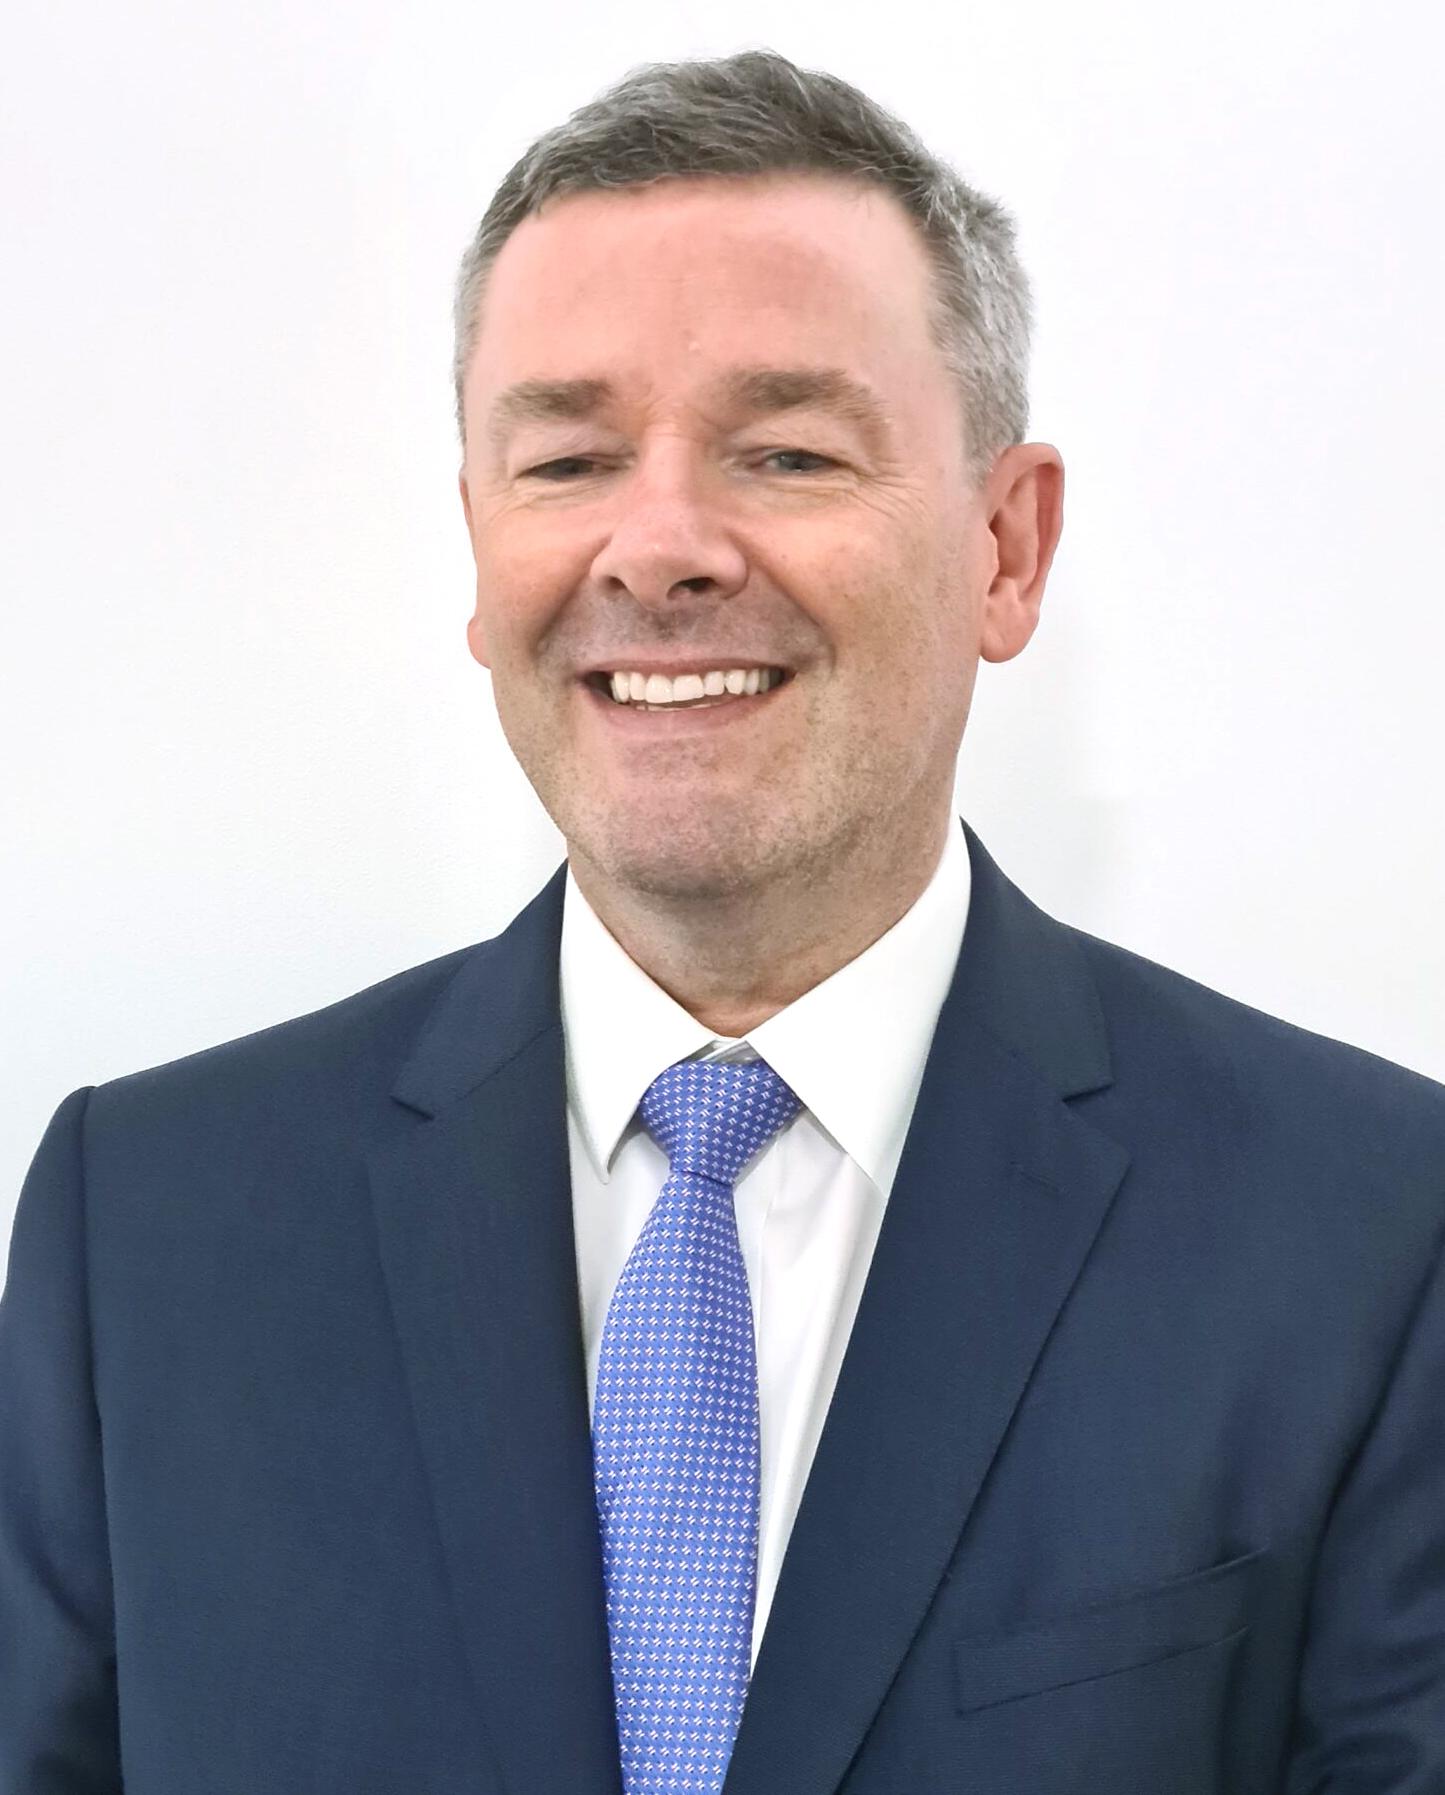 Damian Brannan